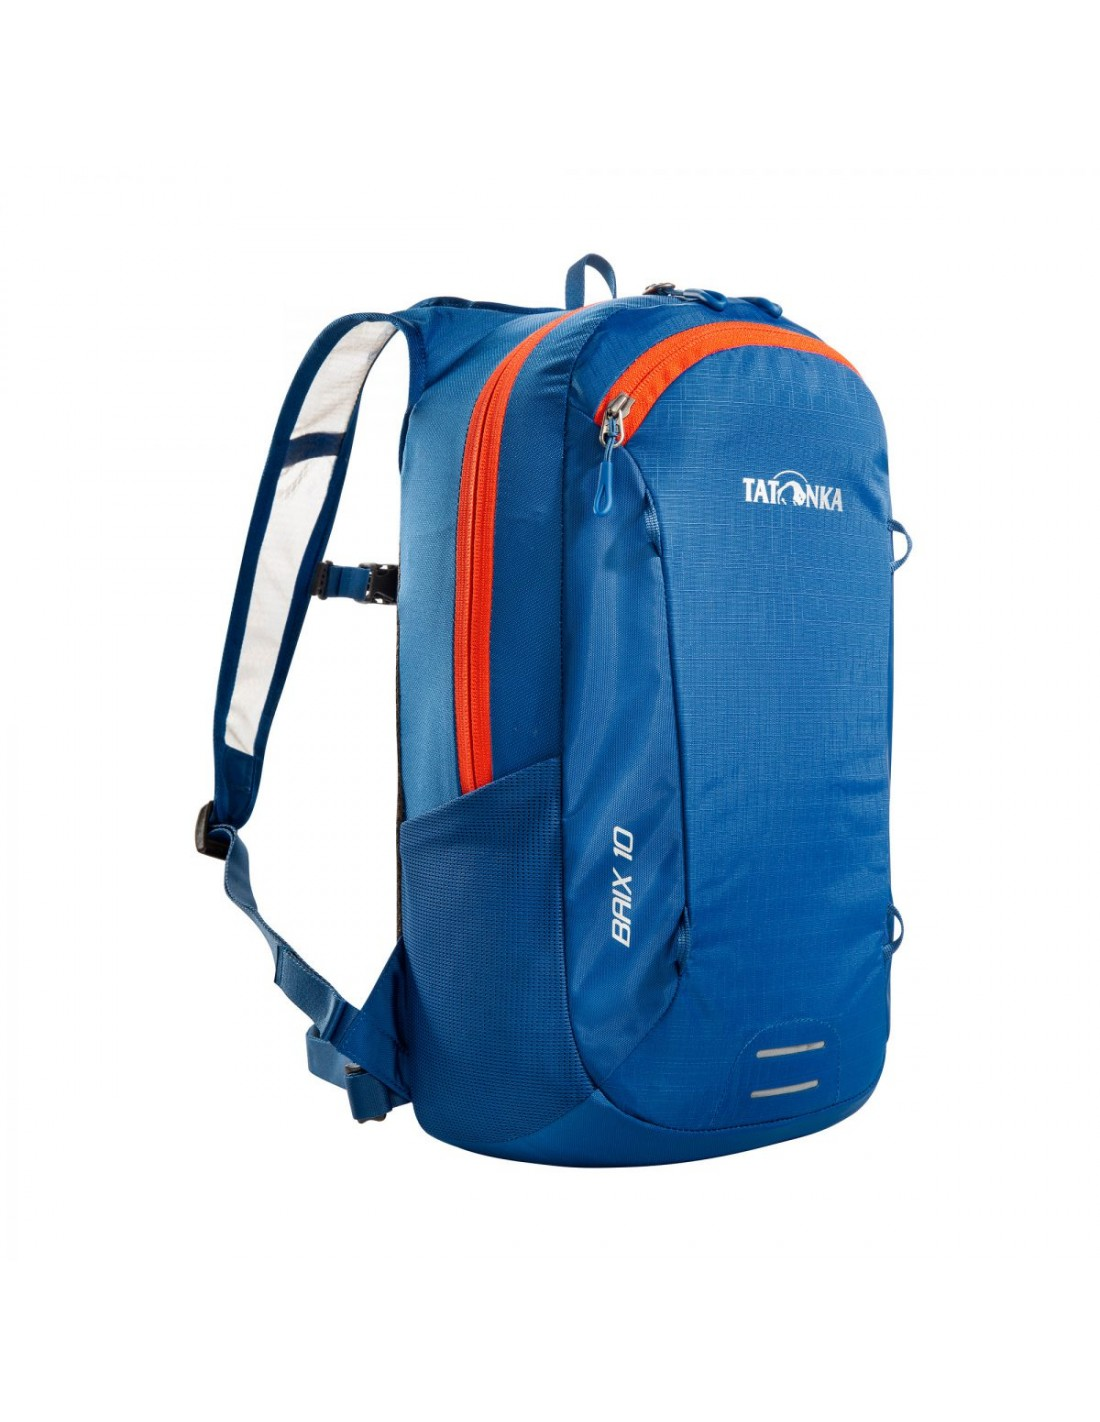 Tatonka Fahrradrucksack Baix 10, blue Rucksackfarbe - Blau, Rucksackvolumen günstig online kaufen